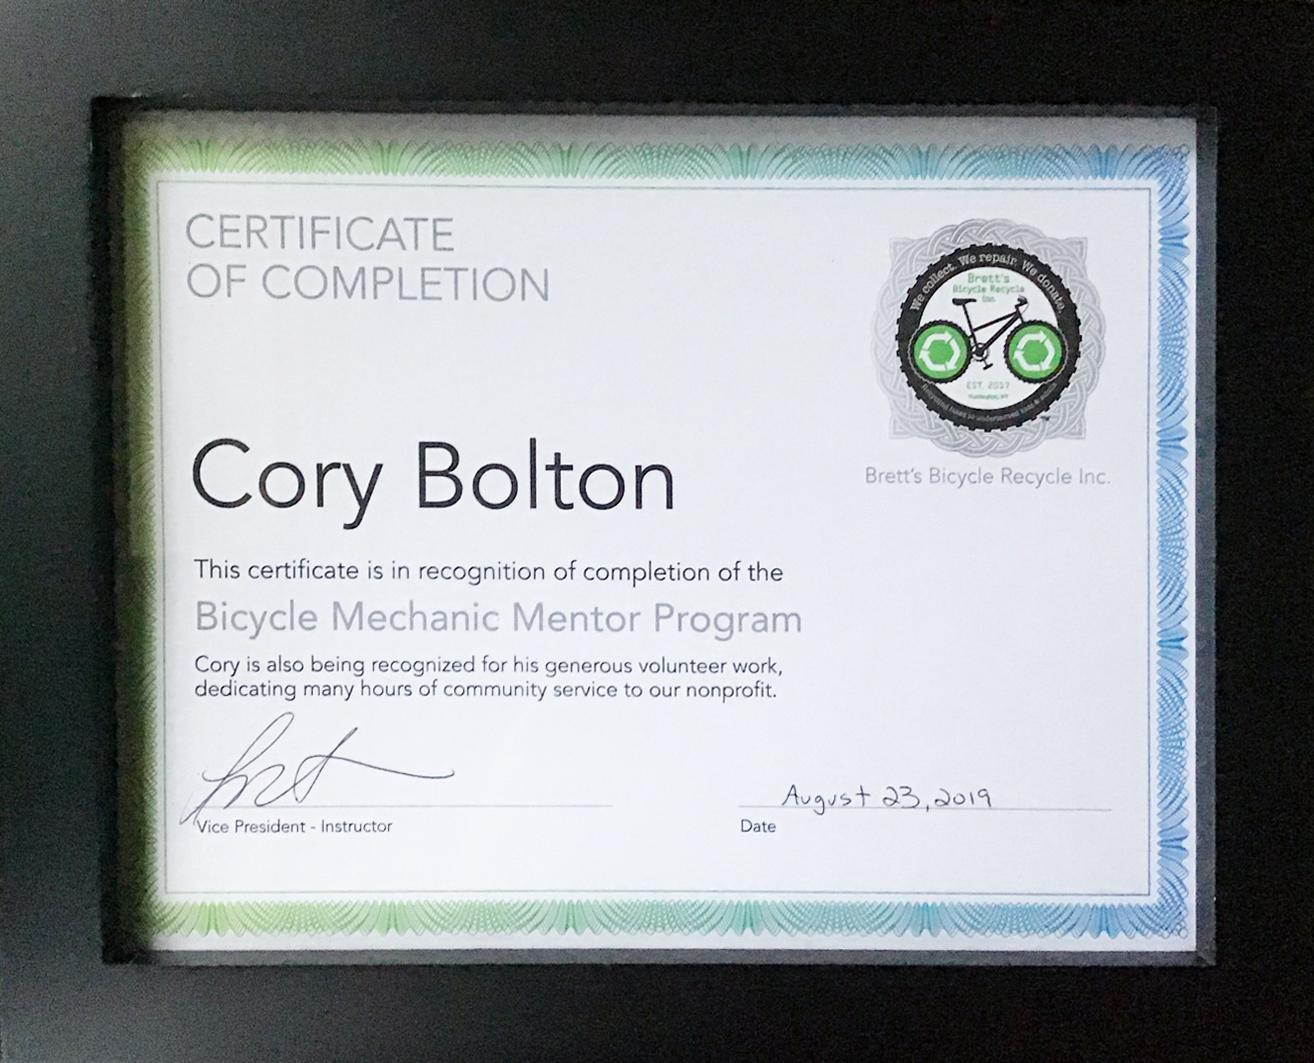 Cory Bolton Certificate.jpg